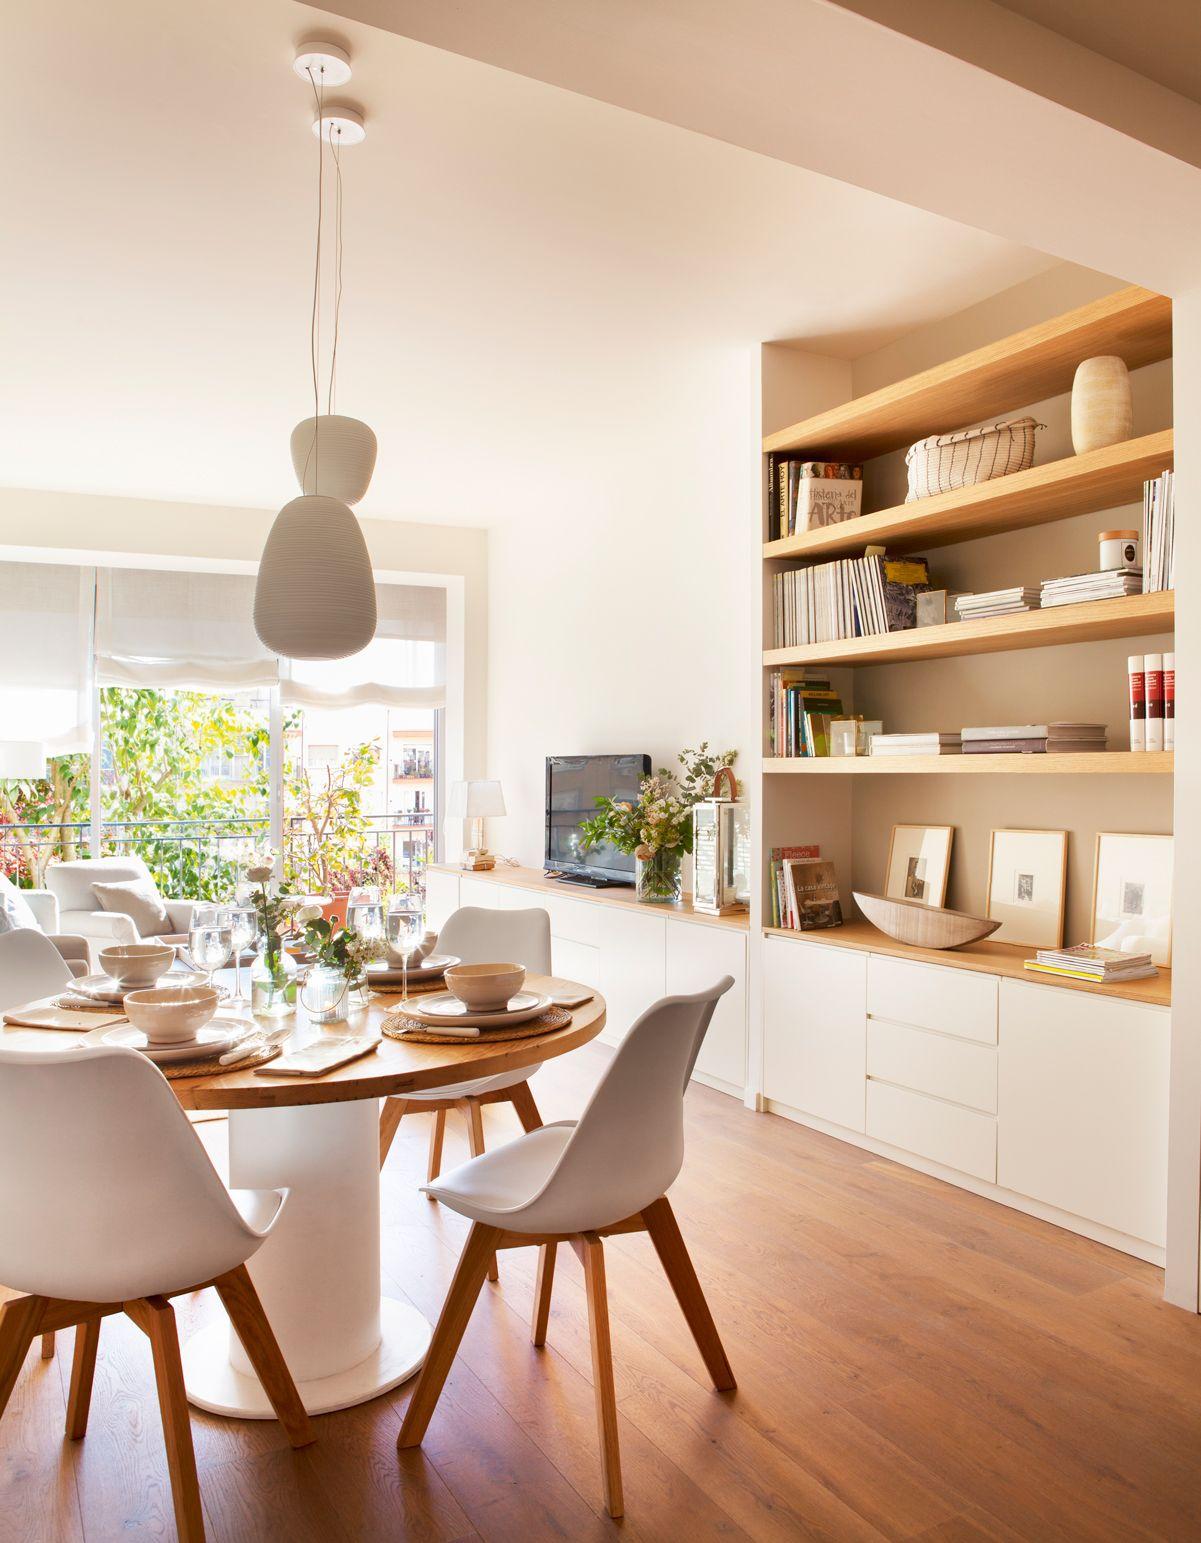 Comedor con mesa redonda y librer a con baldas de madera for Muebles bajos de salon modernos